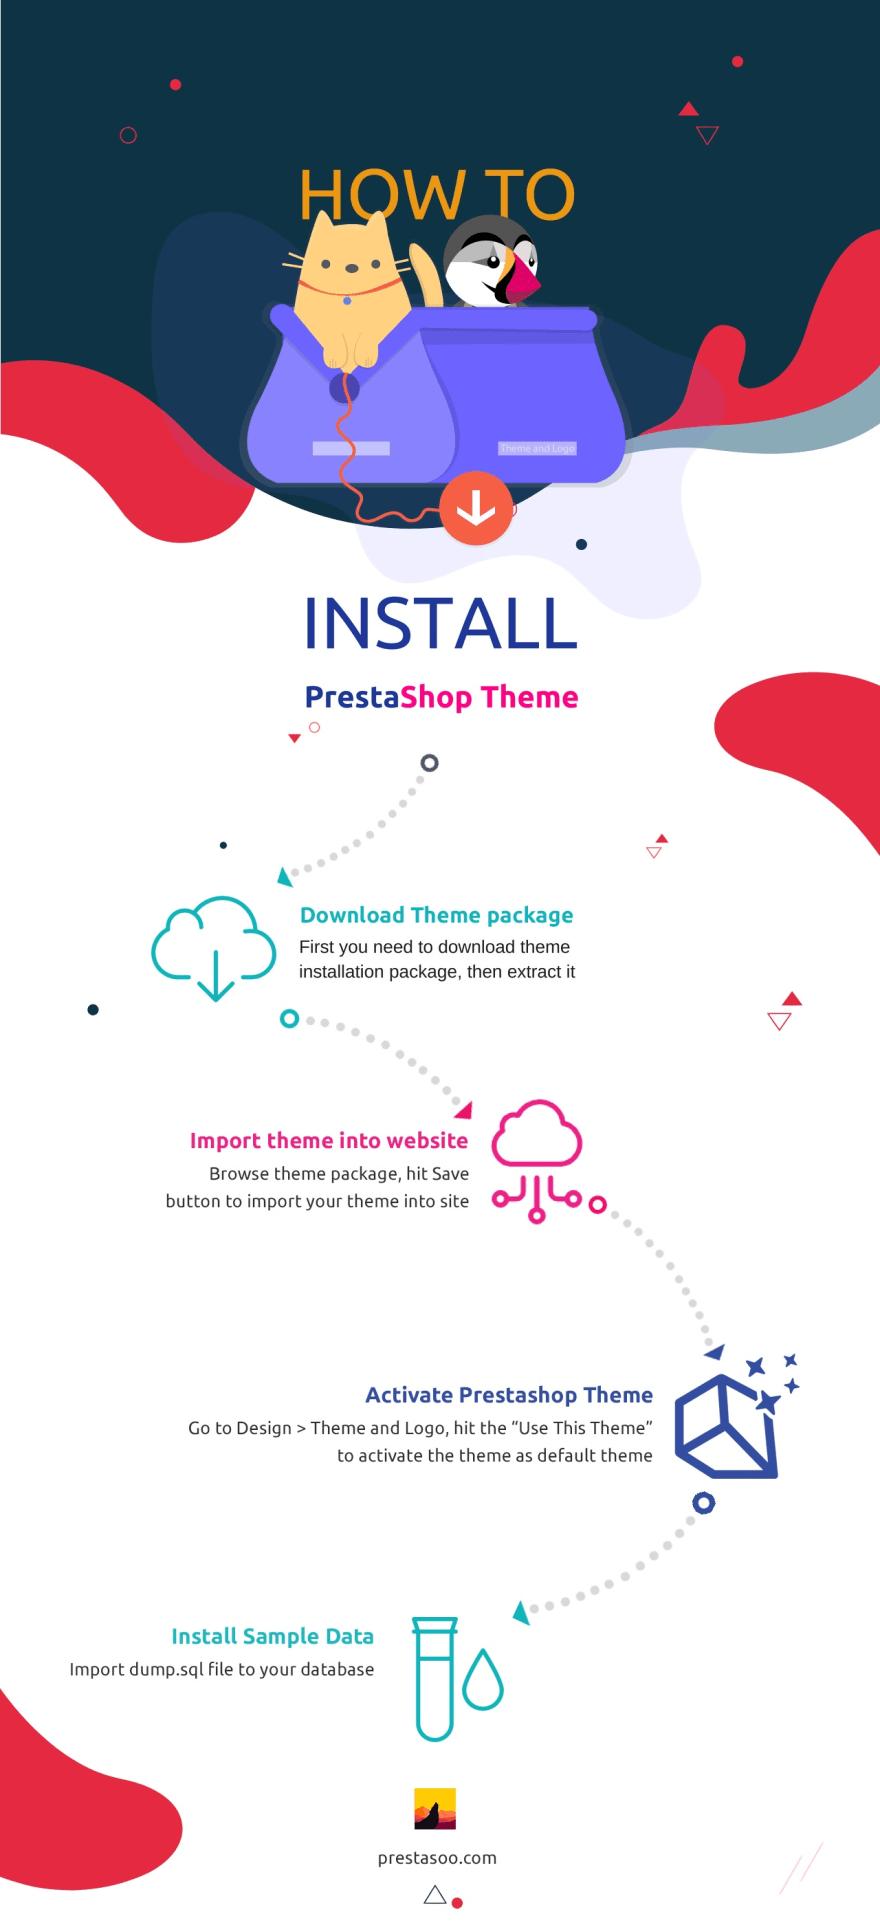 How to install Prestashop Theme - Infographic